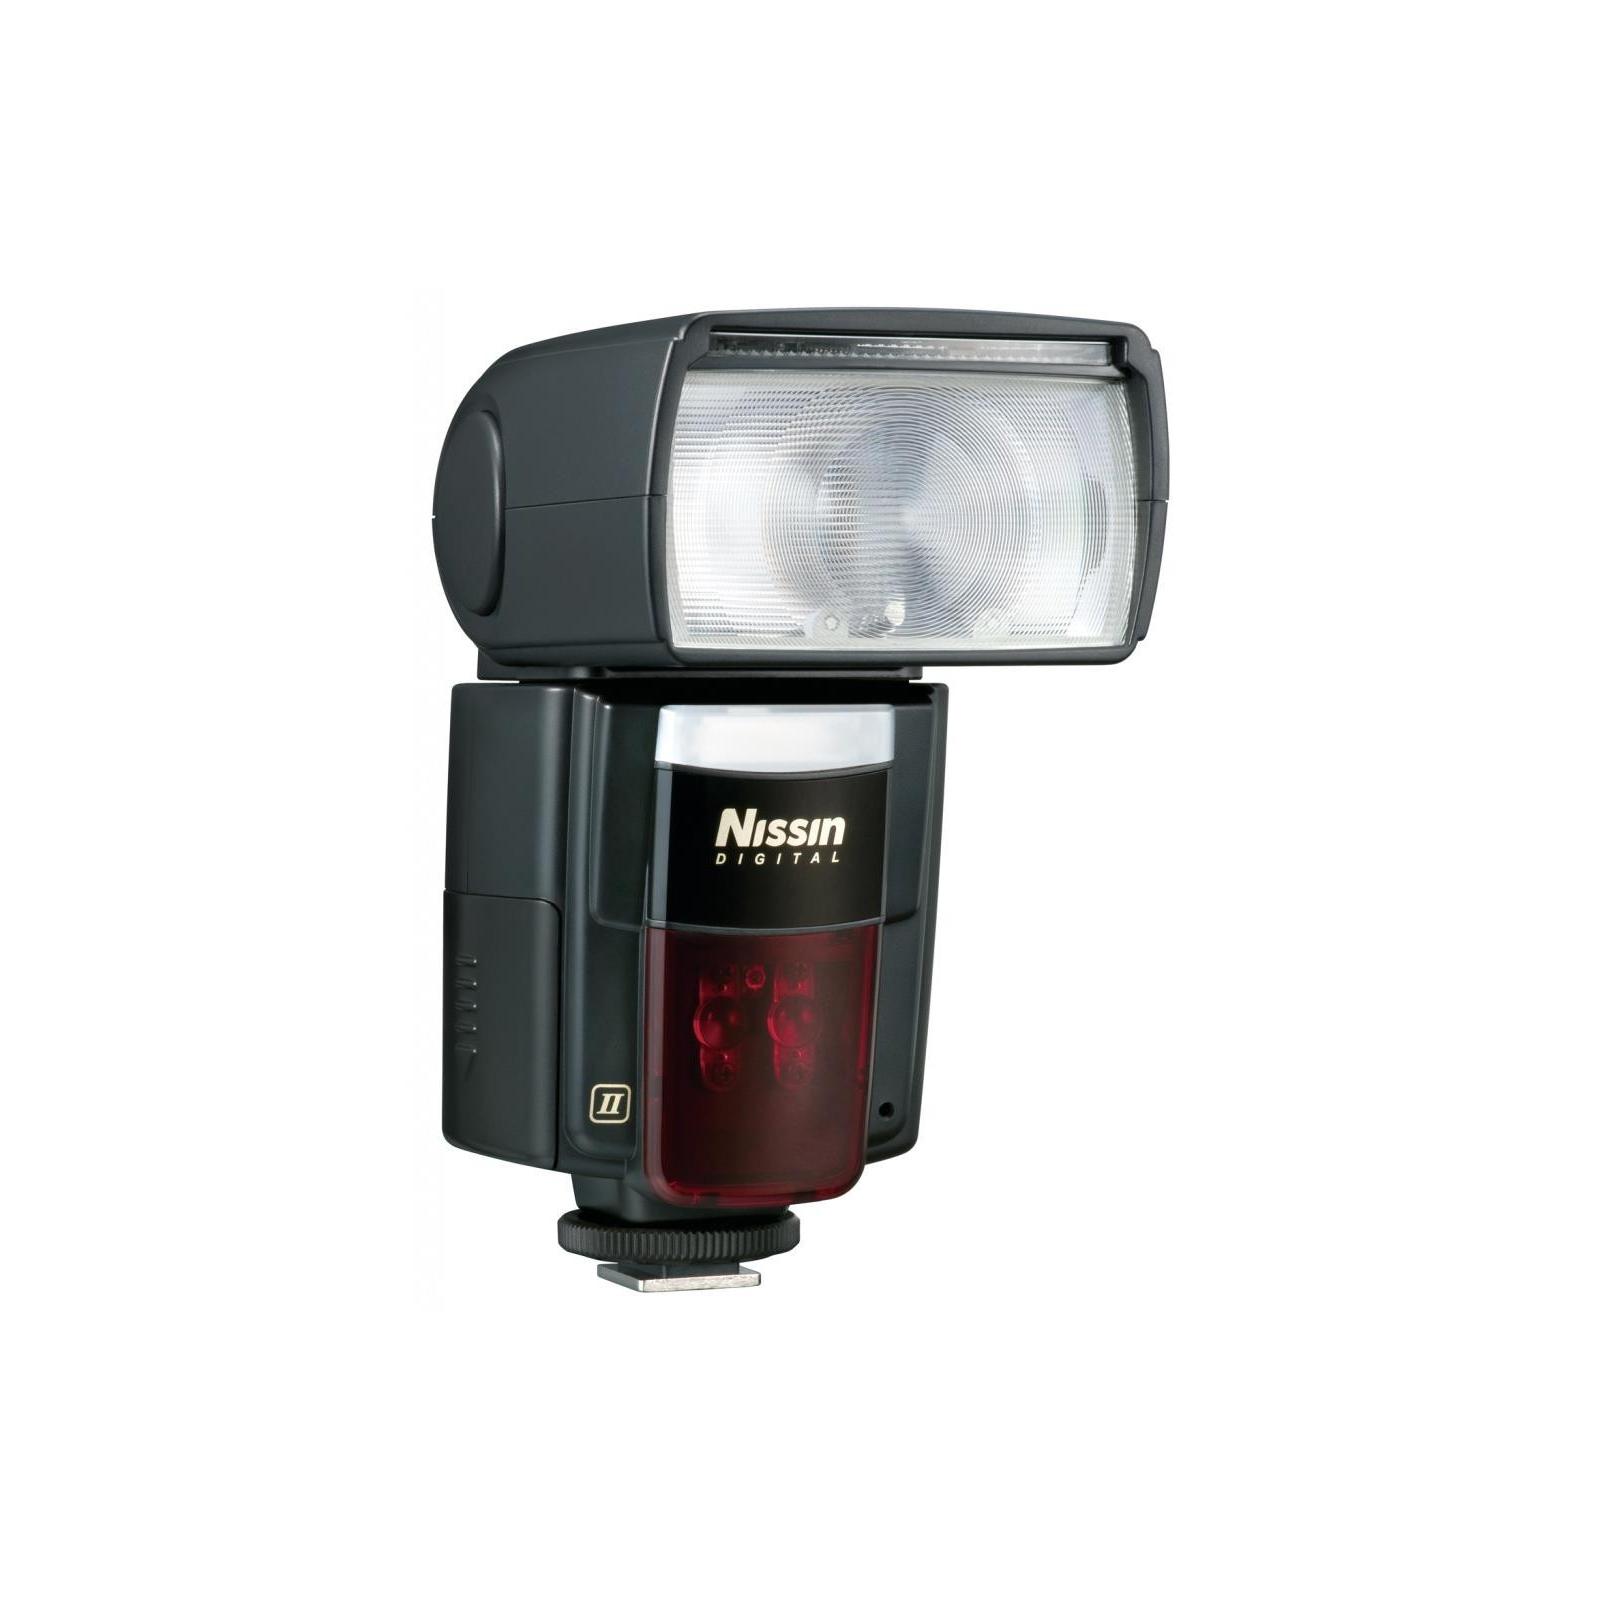 Вспышка Nissin Speedlite Di866 Mark II Sony Alpha + Powerex 2700 (NI-DI822IIS)